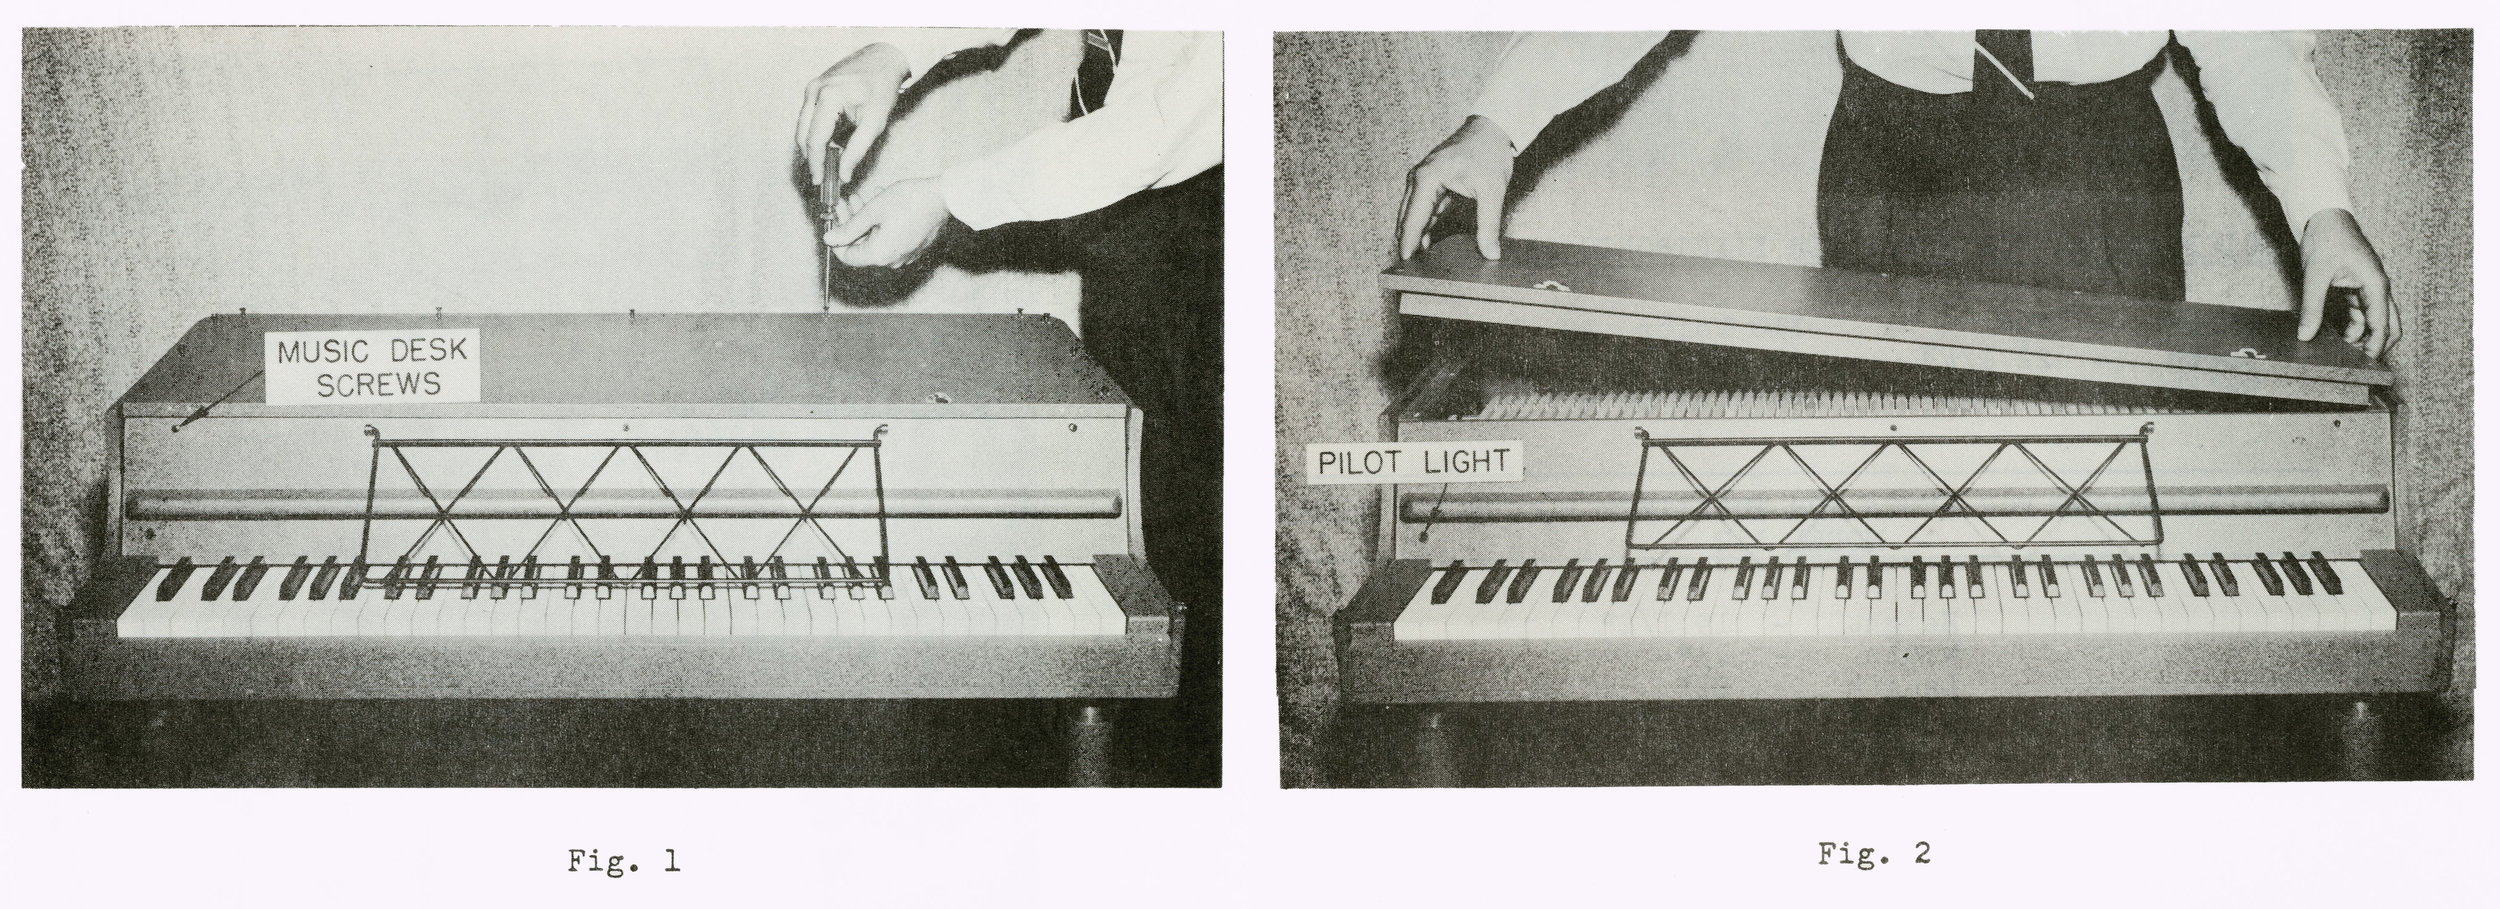 removing-the-wurlitzer-112-lid.jpg